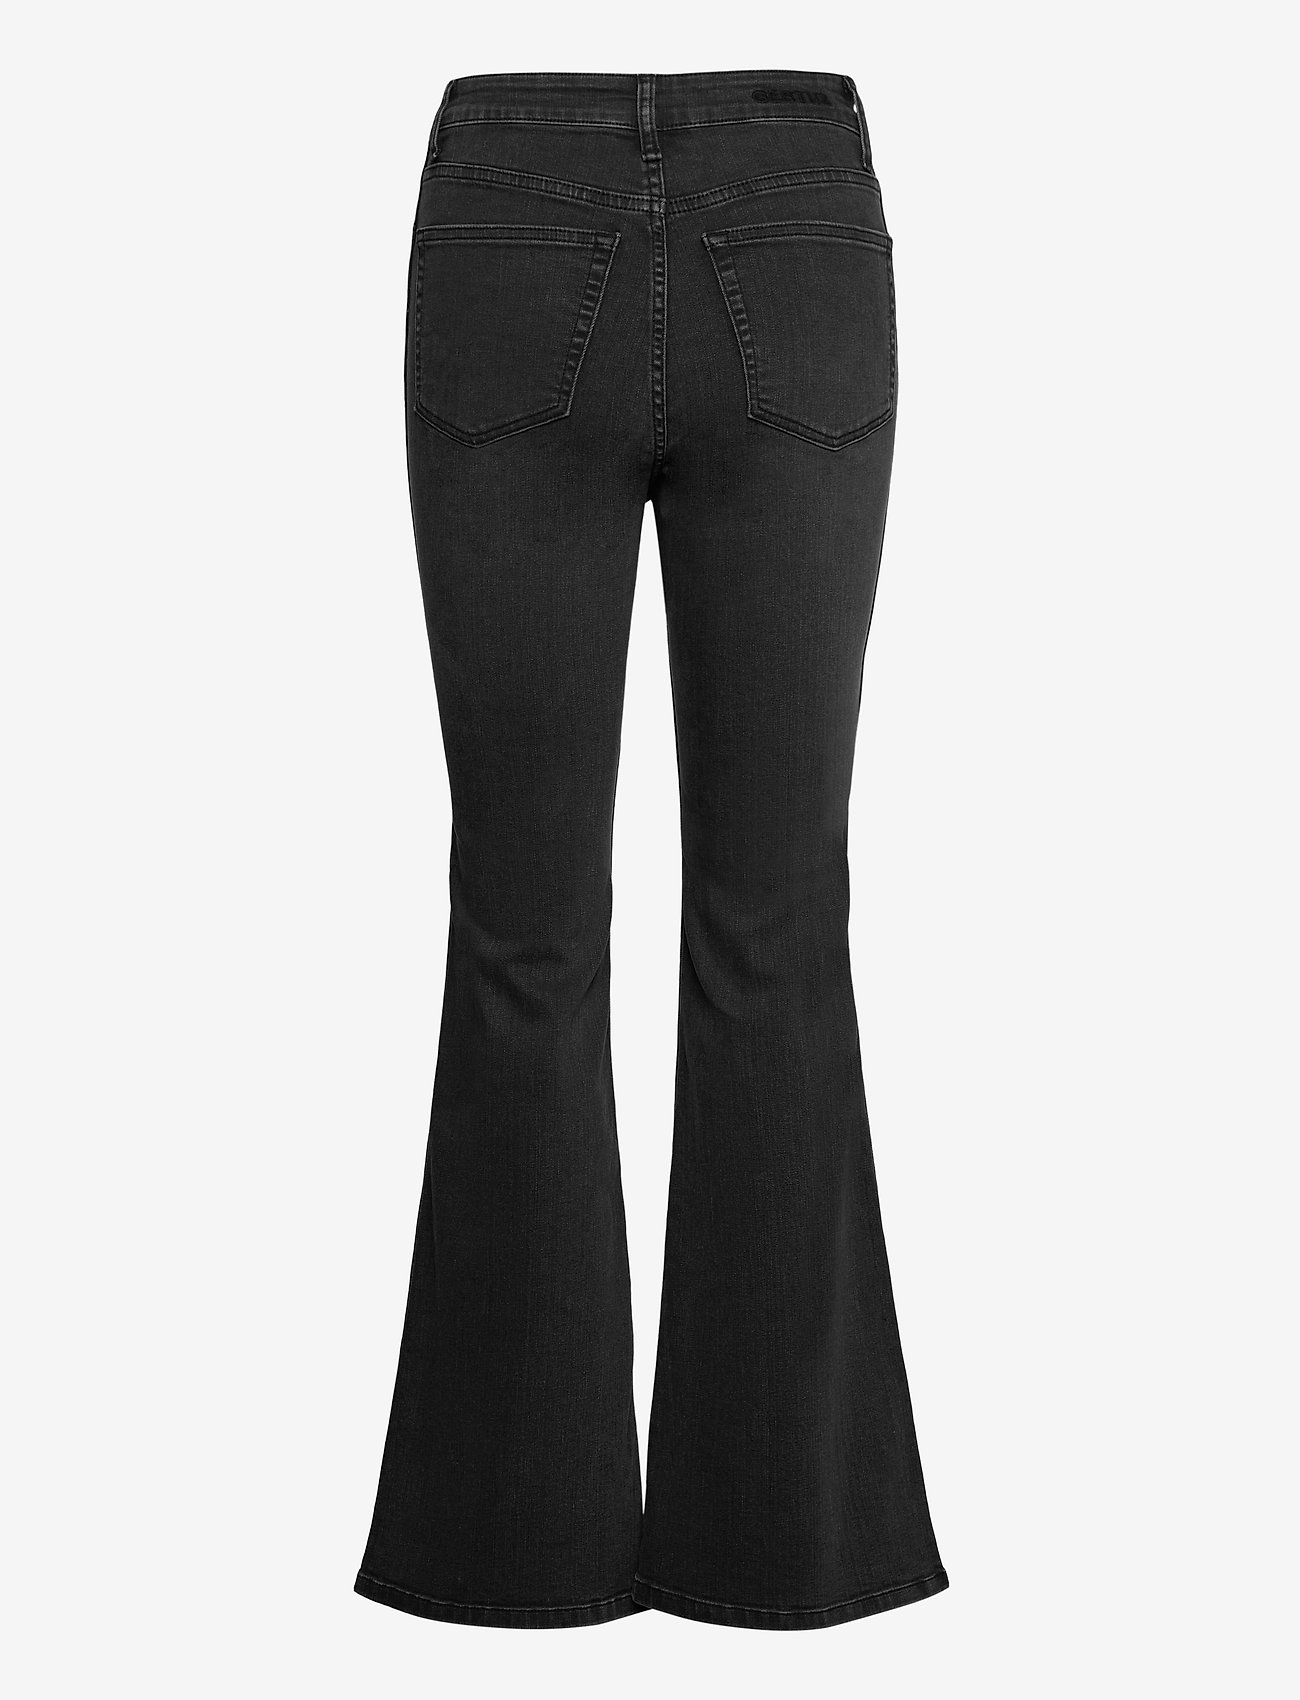 Gestuz - EmilindaGZ HW flared jeans NOOS - schlaghosen - washed grey - 1